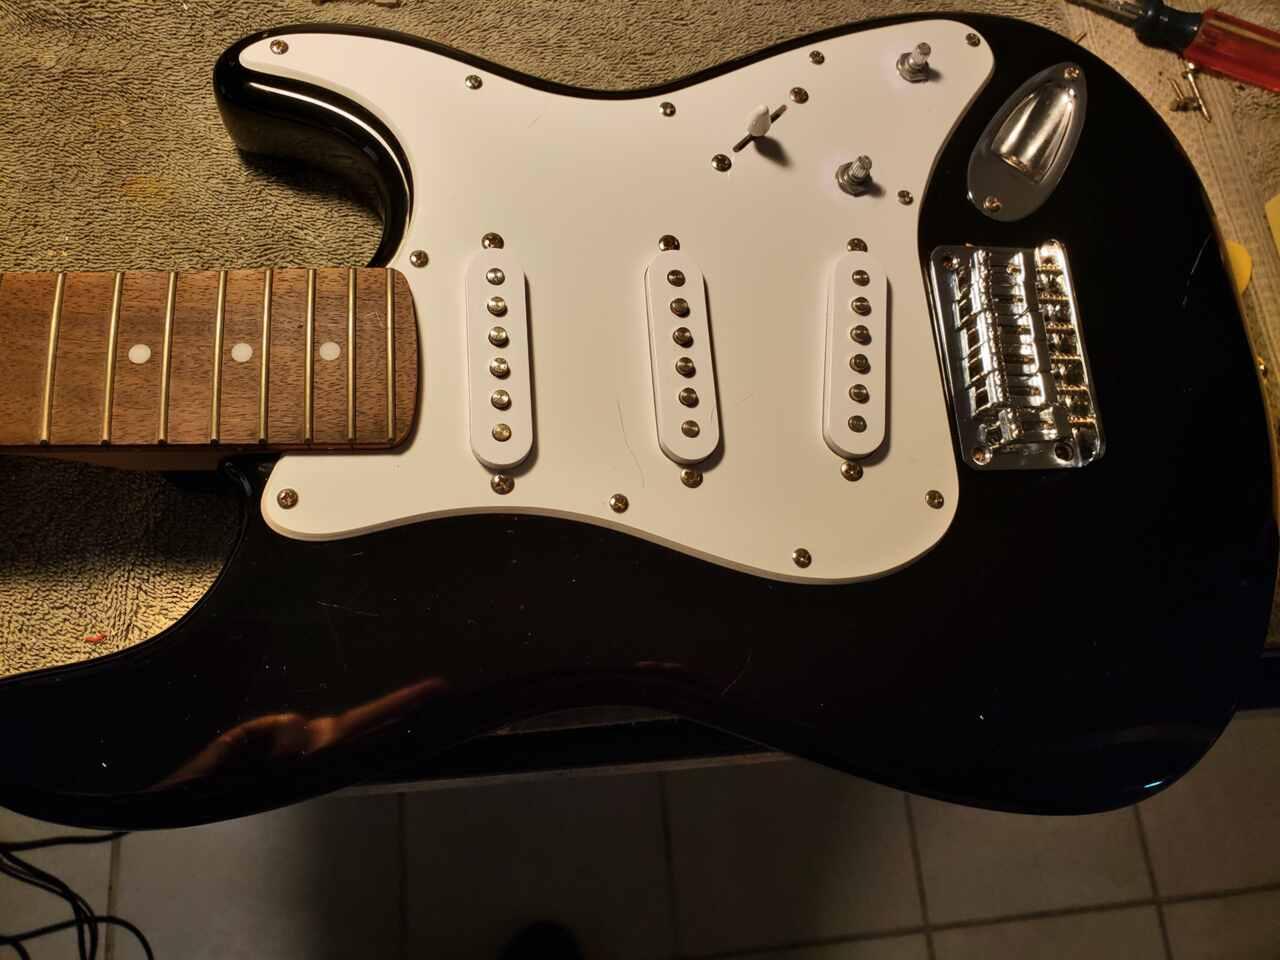 Fender Squier Mini Wiring Diagram on